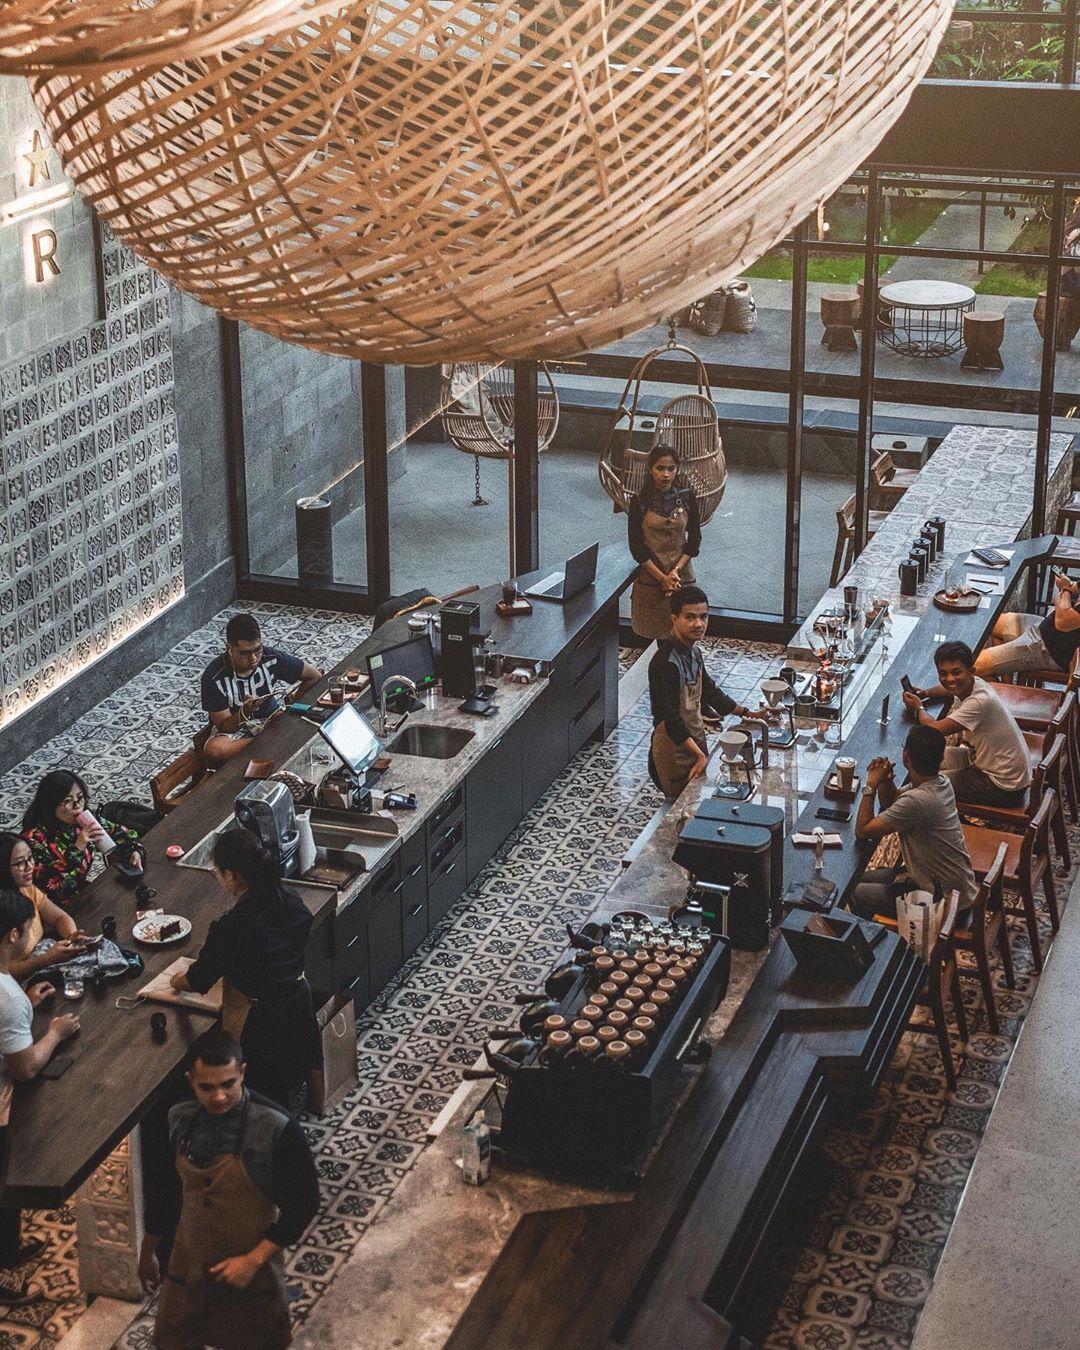 Lokasi Dekorasi Starbucks Reserve Dewata Bali Indonesia - Dewata ID